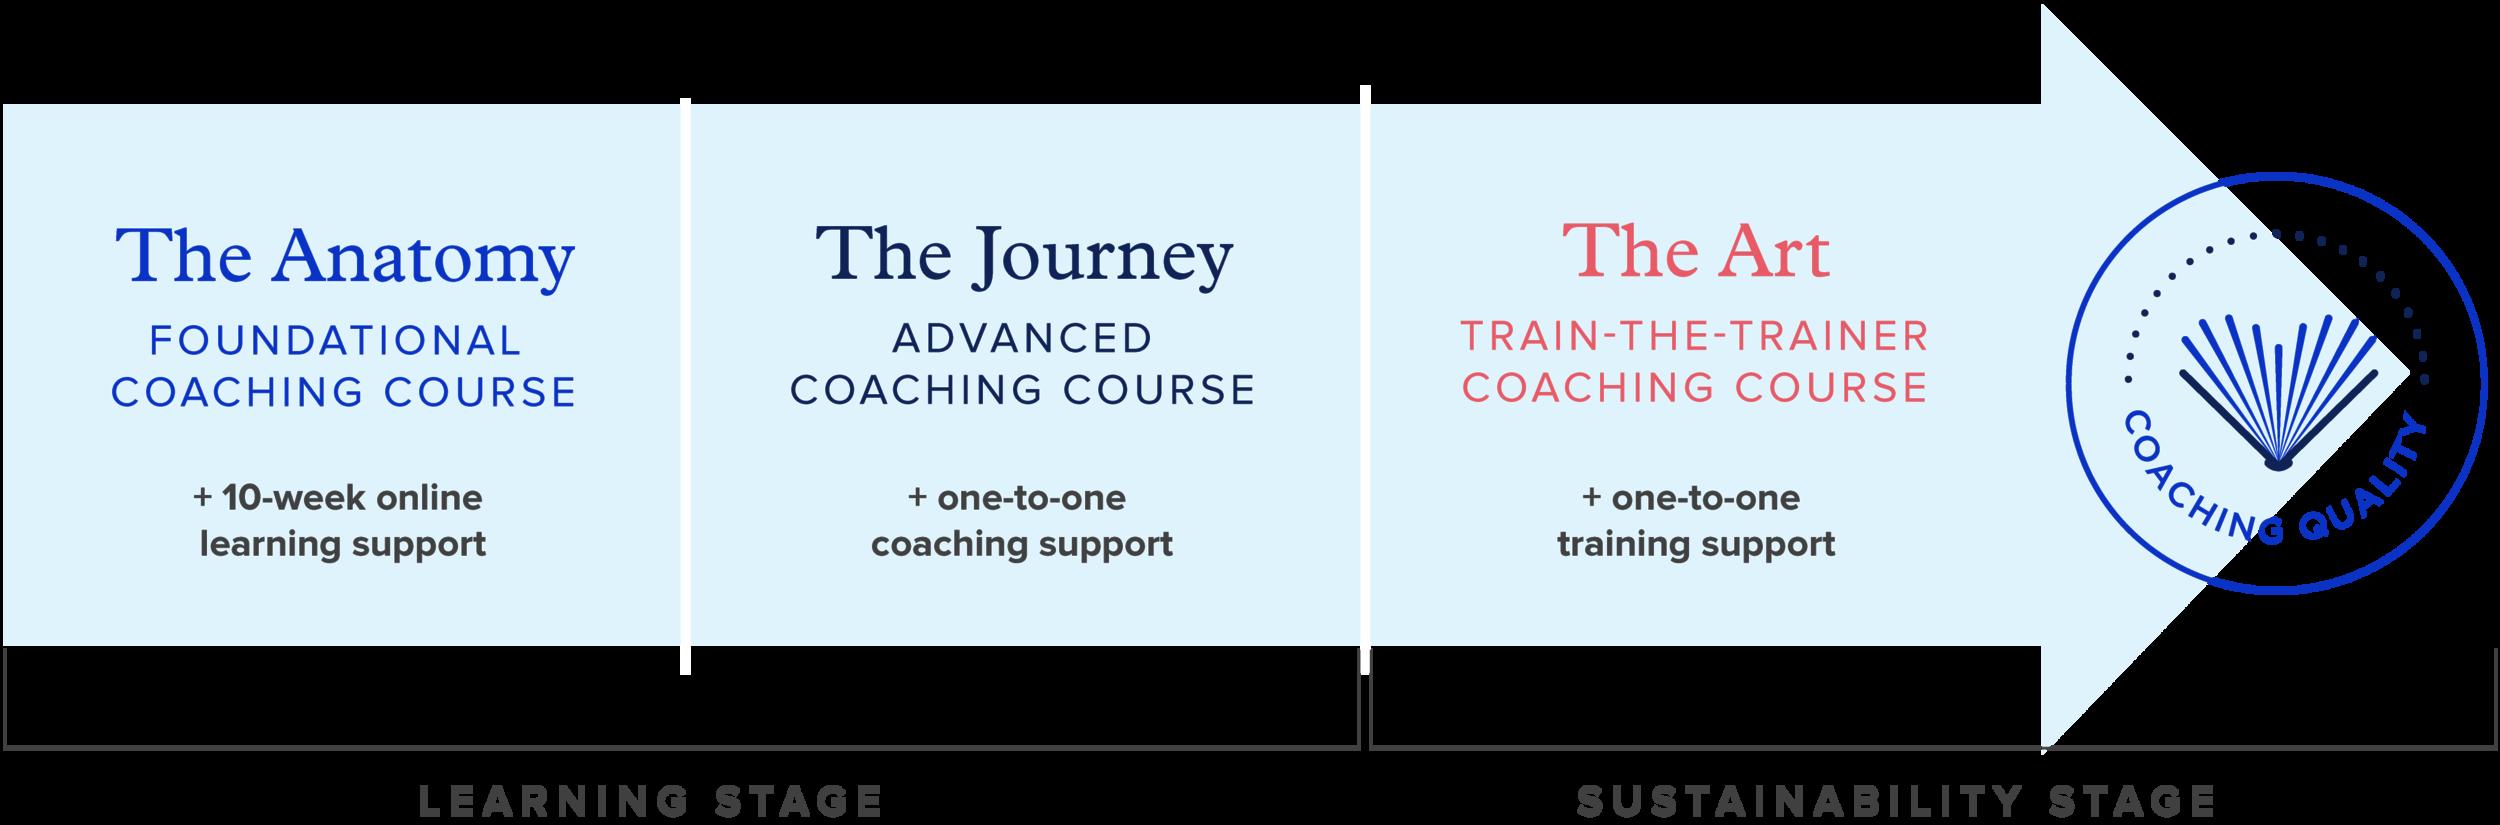 Graydin_Coaching_Courses_Schools_Educators_Teachers_Leaders_Administrators_Beginner_London_Toronto_NewYork_CCSDiagram-25.png